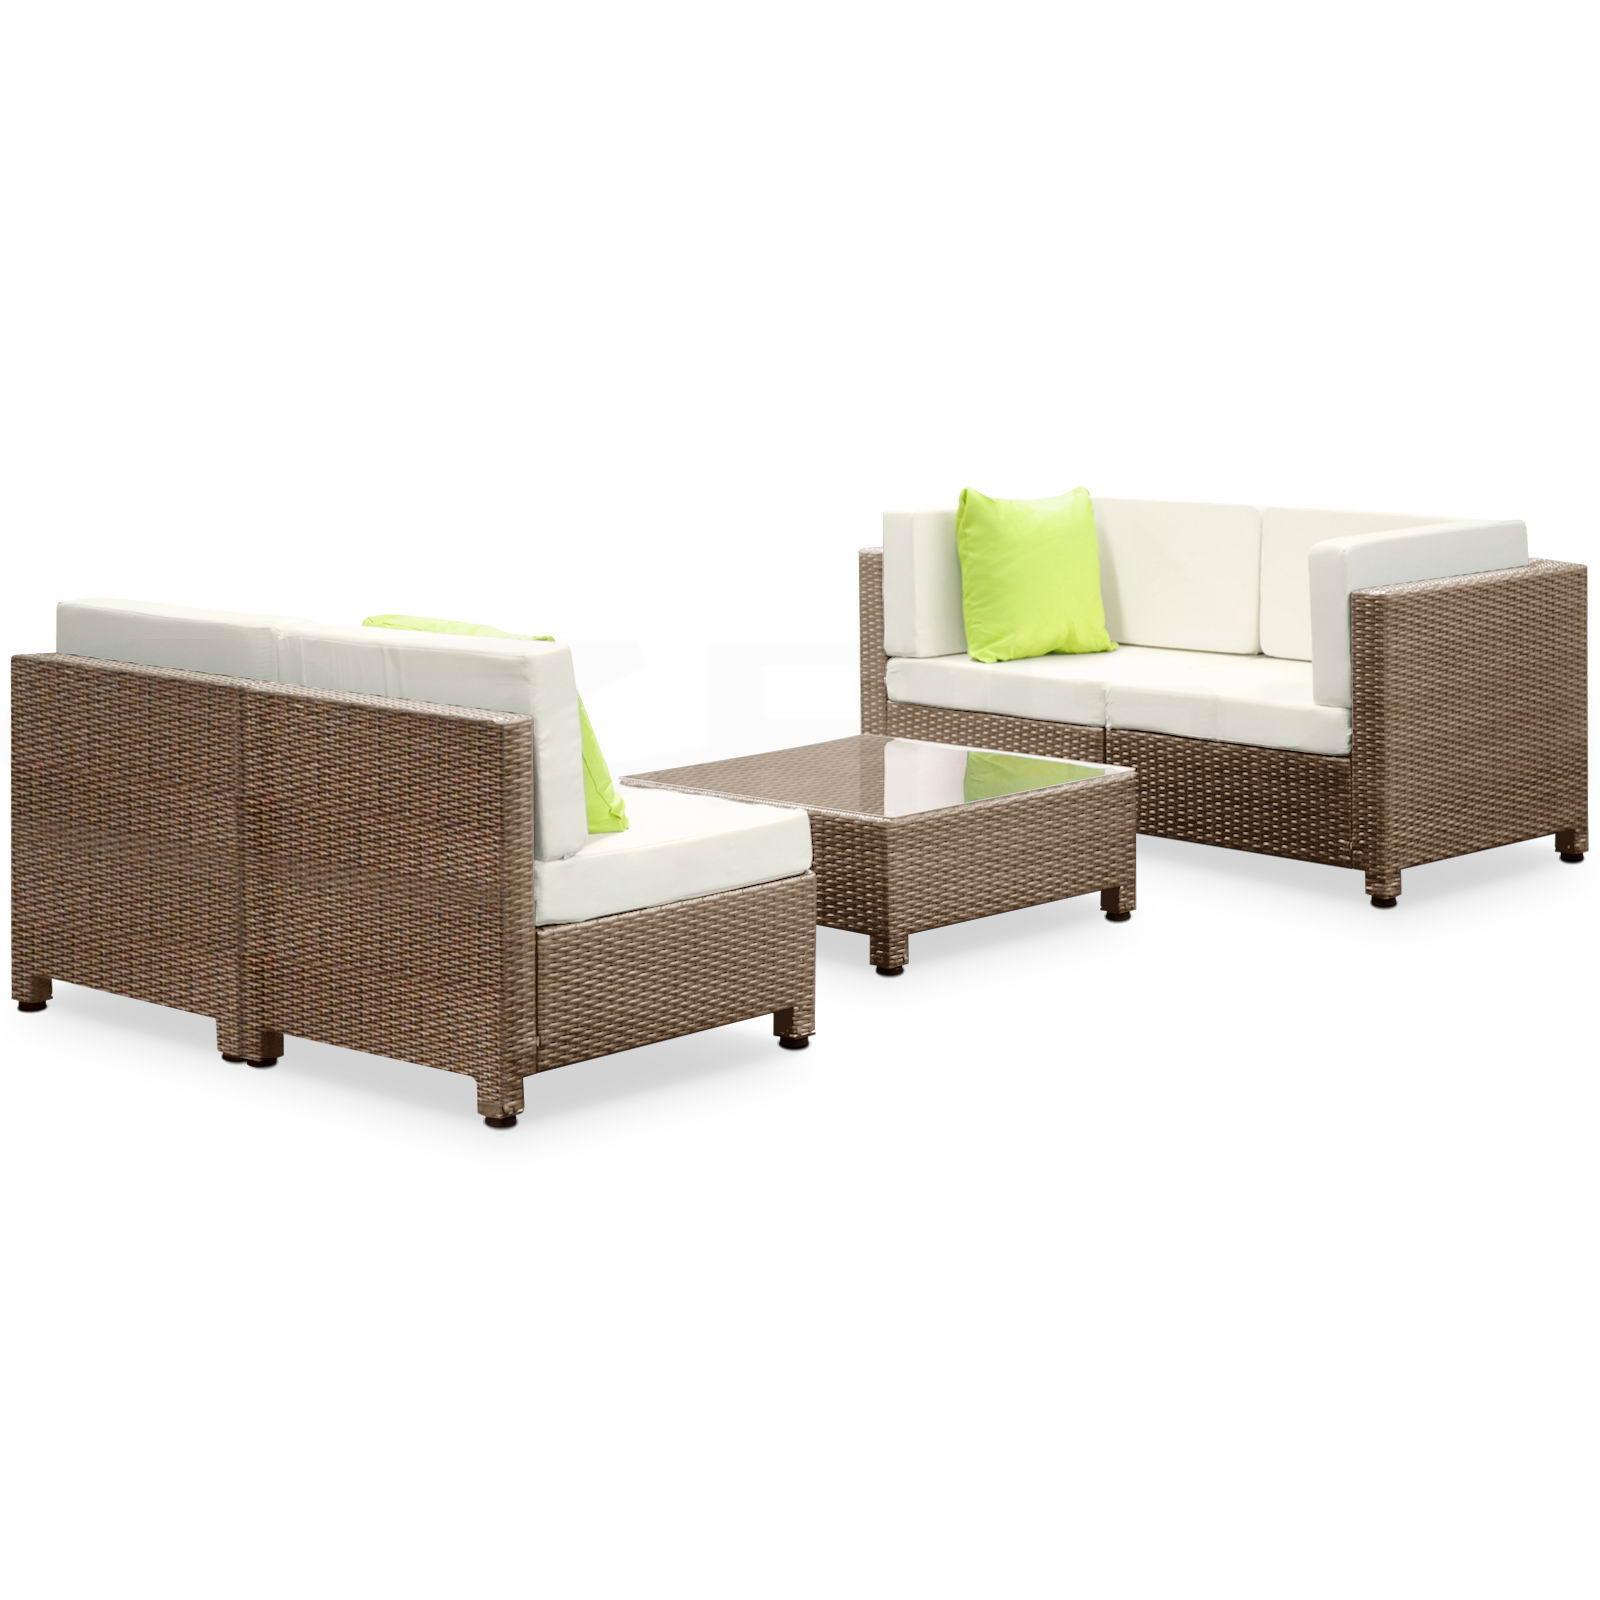 Black Brown Outdoor Furniture Wicker Pe Rattan Set Garden Lounge Sofa Bali Ebay